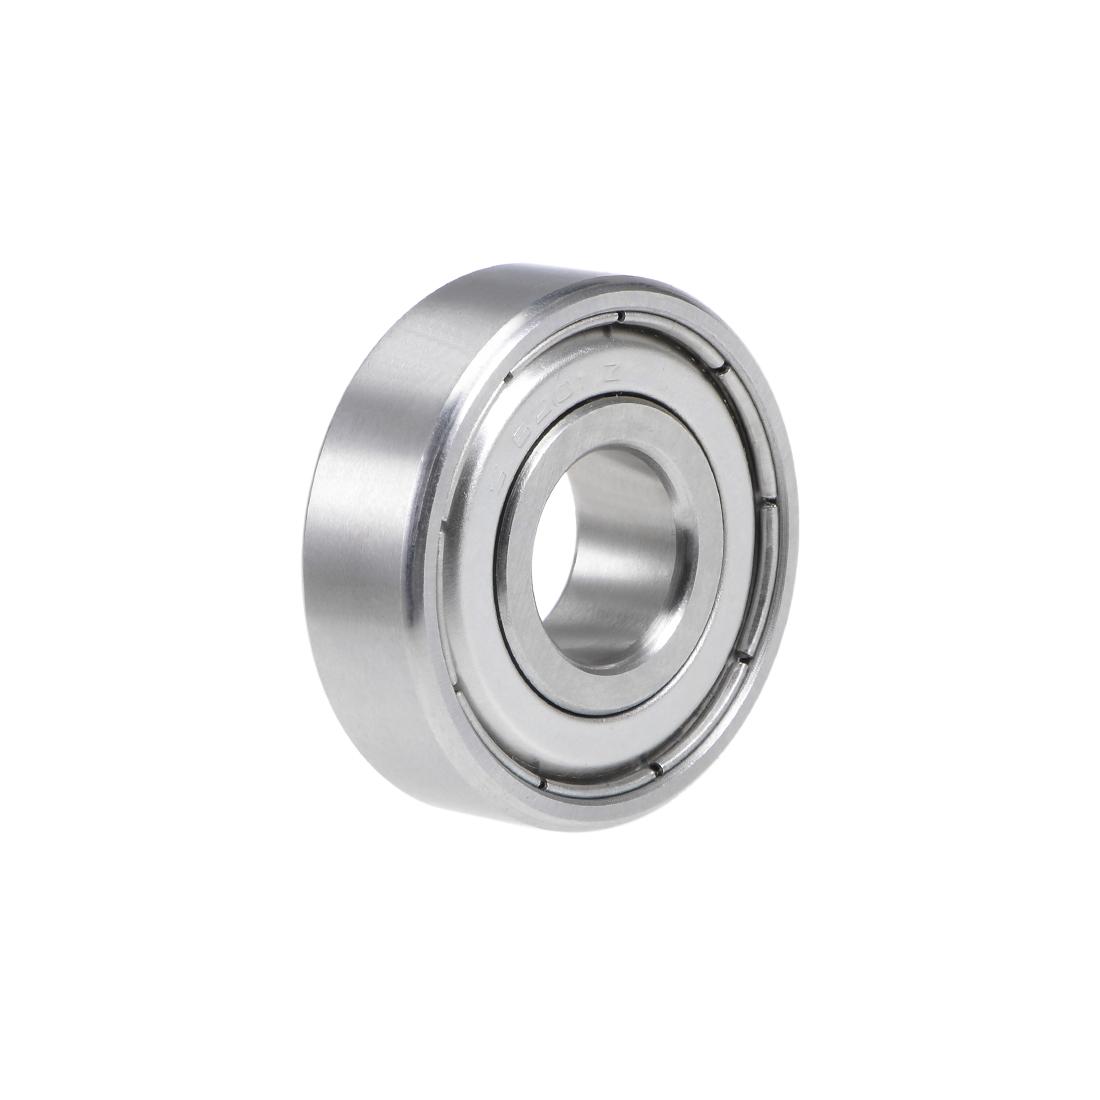 S6201ZZ Stainless Steel Ball Bearing 12x32x10mm Double Shielded 6201Z Bearings